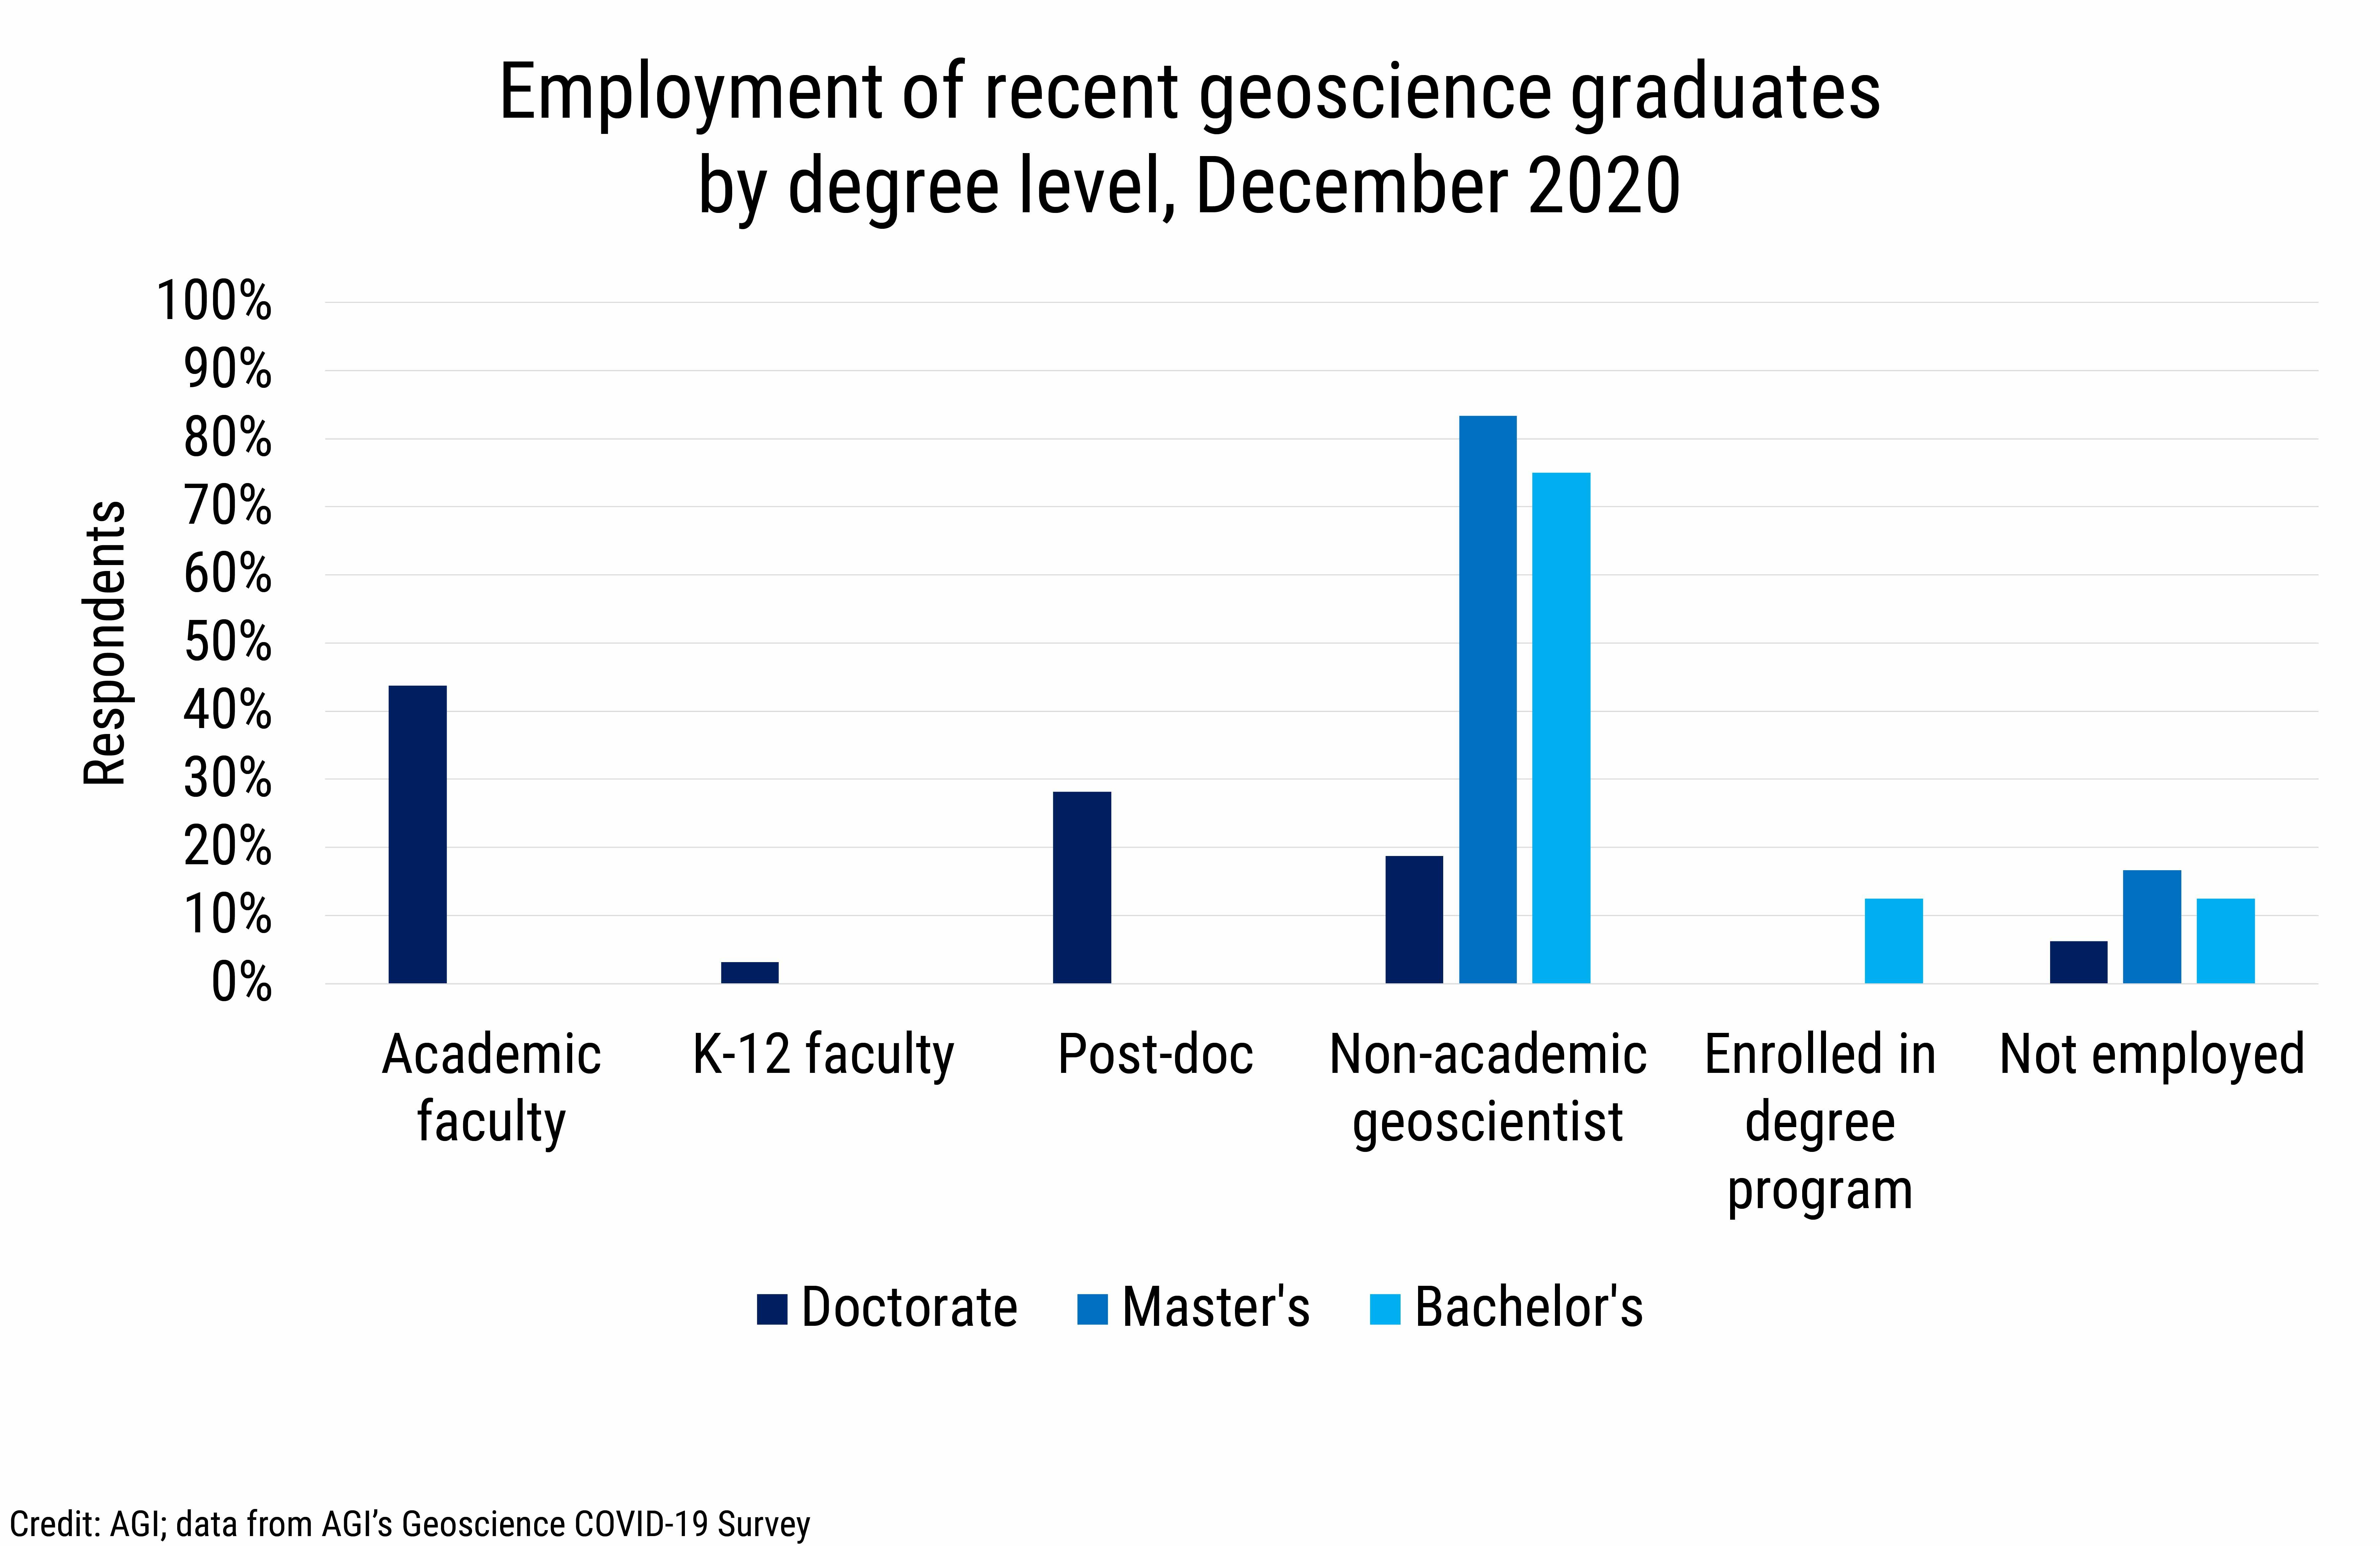 DB_2021-003_chart05: Employment of recent geoscience graduates by degree level, December 2020 (Credit: AGI; data from AGI's Geoscience COVID-19 Survey)